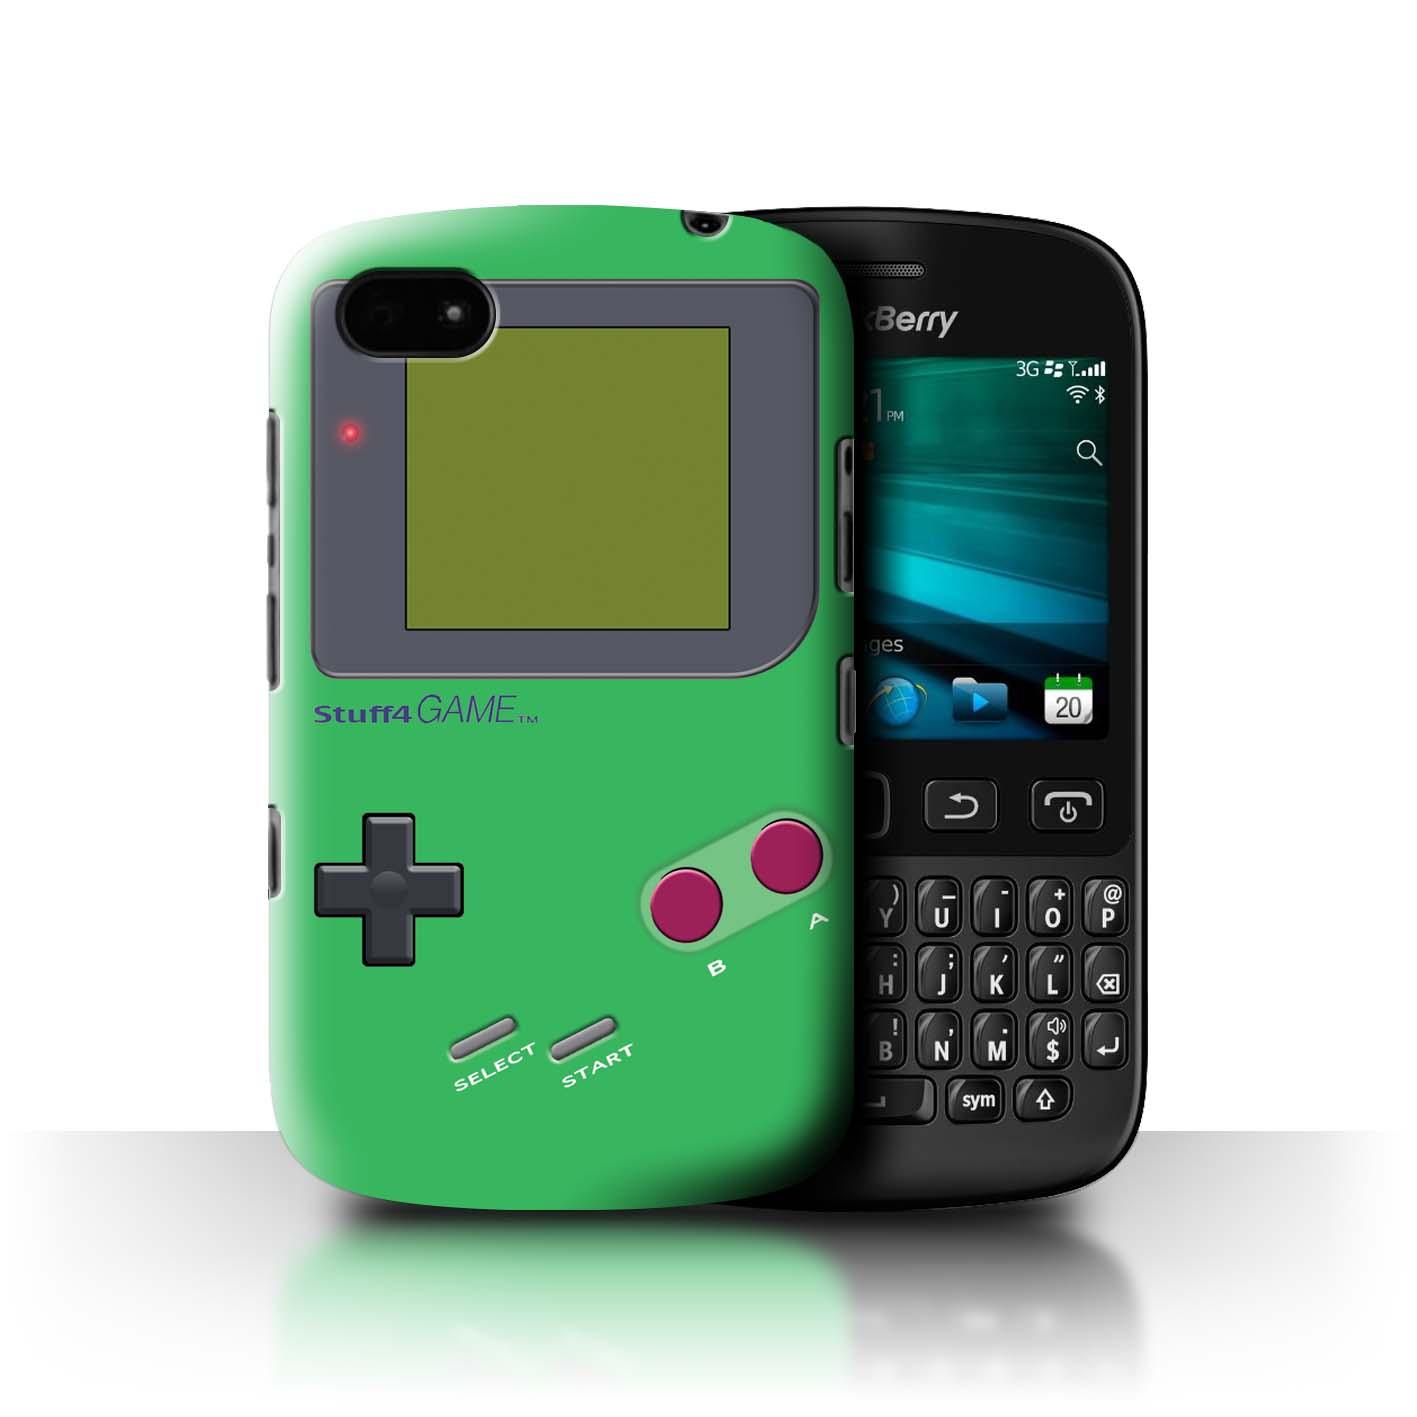 STUFF4-Coque-Etui-pour-Blackberry-Smartphone-Jeu-Video-Gameboy-Protection-Housse